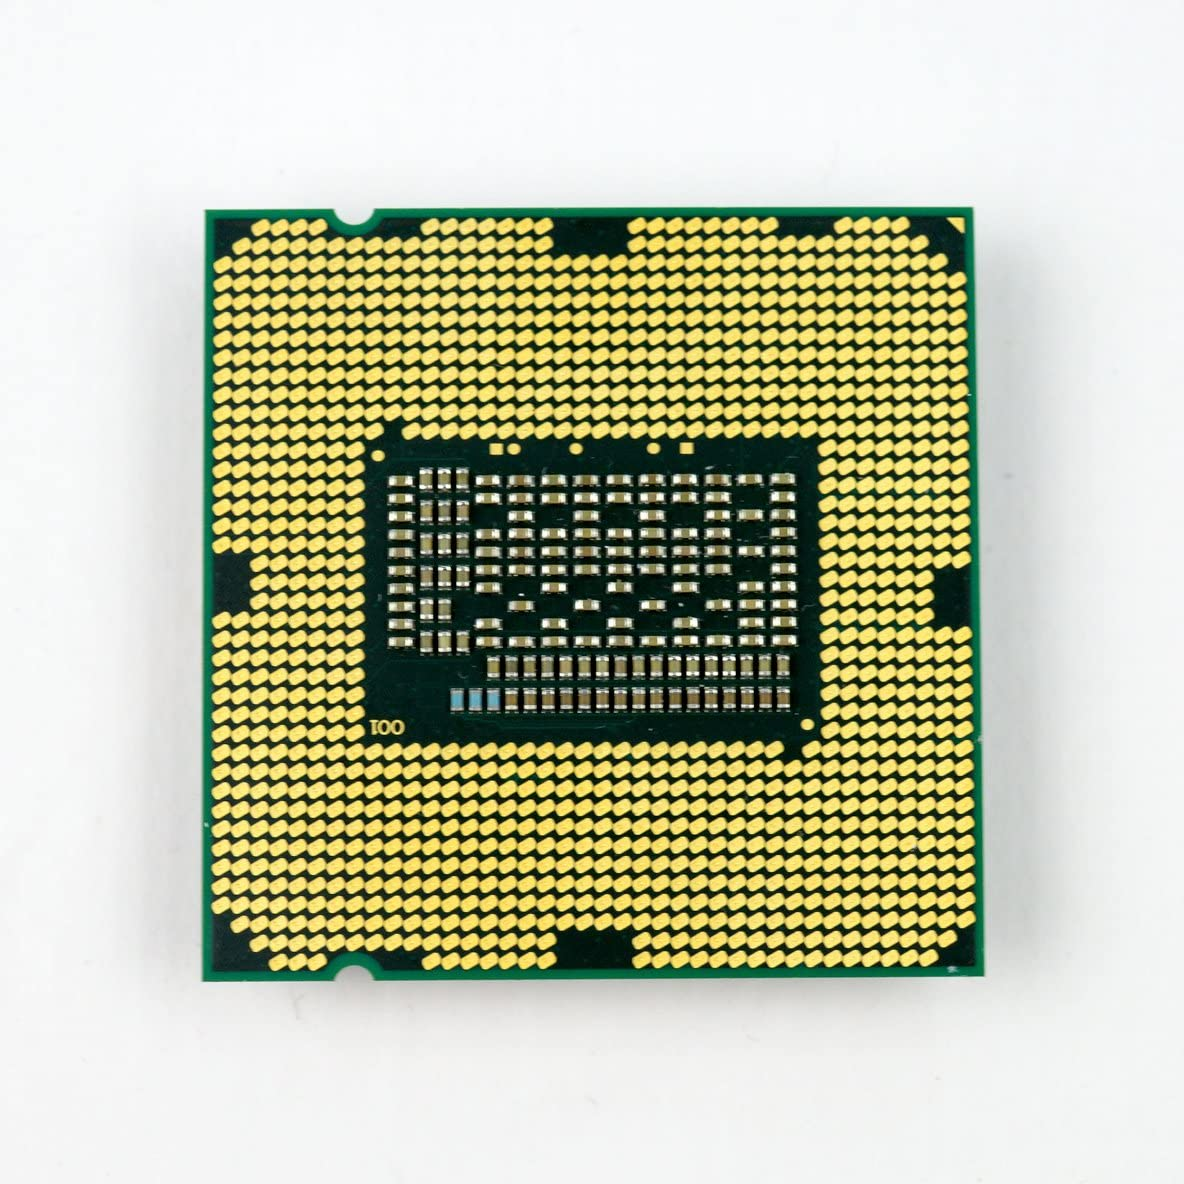 INTEL SR00S Intel CORE i5-2400S 2.5GHz 6M Quad Core 5GT//s CPU Processor LGA1